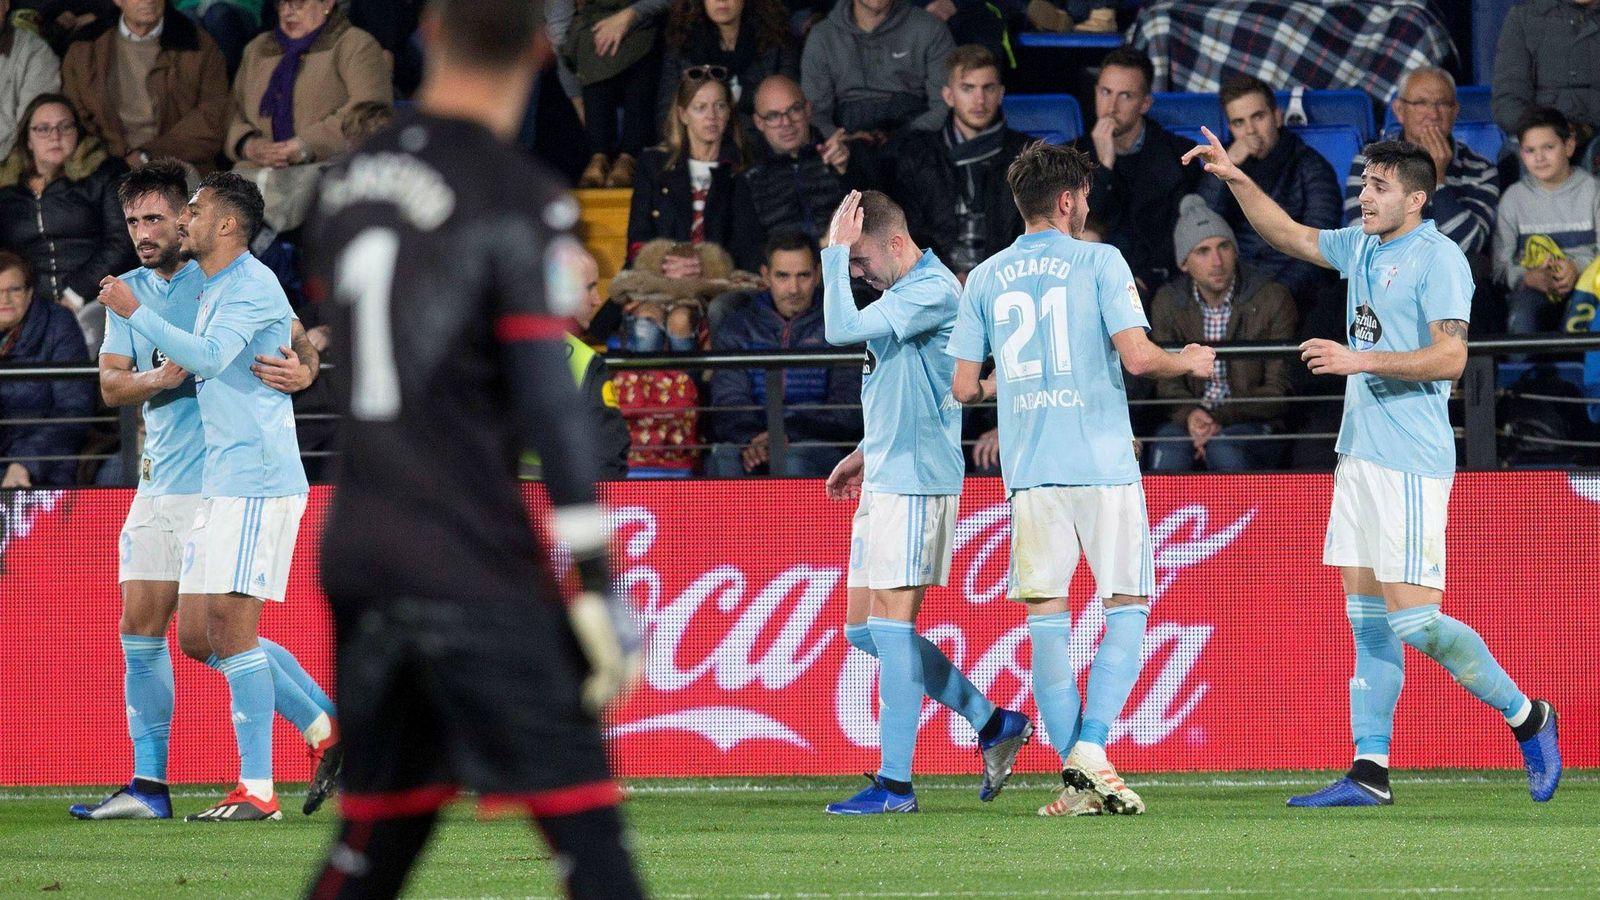 Foto: Jugadores del Celta celebran un gol. (EFE)